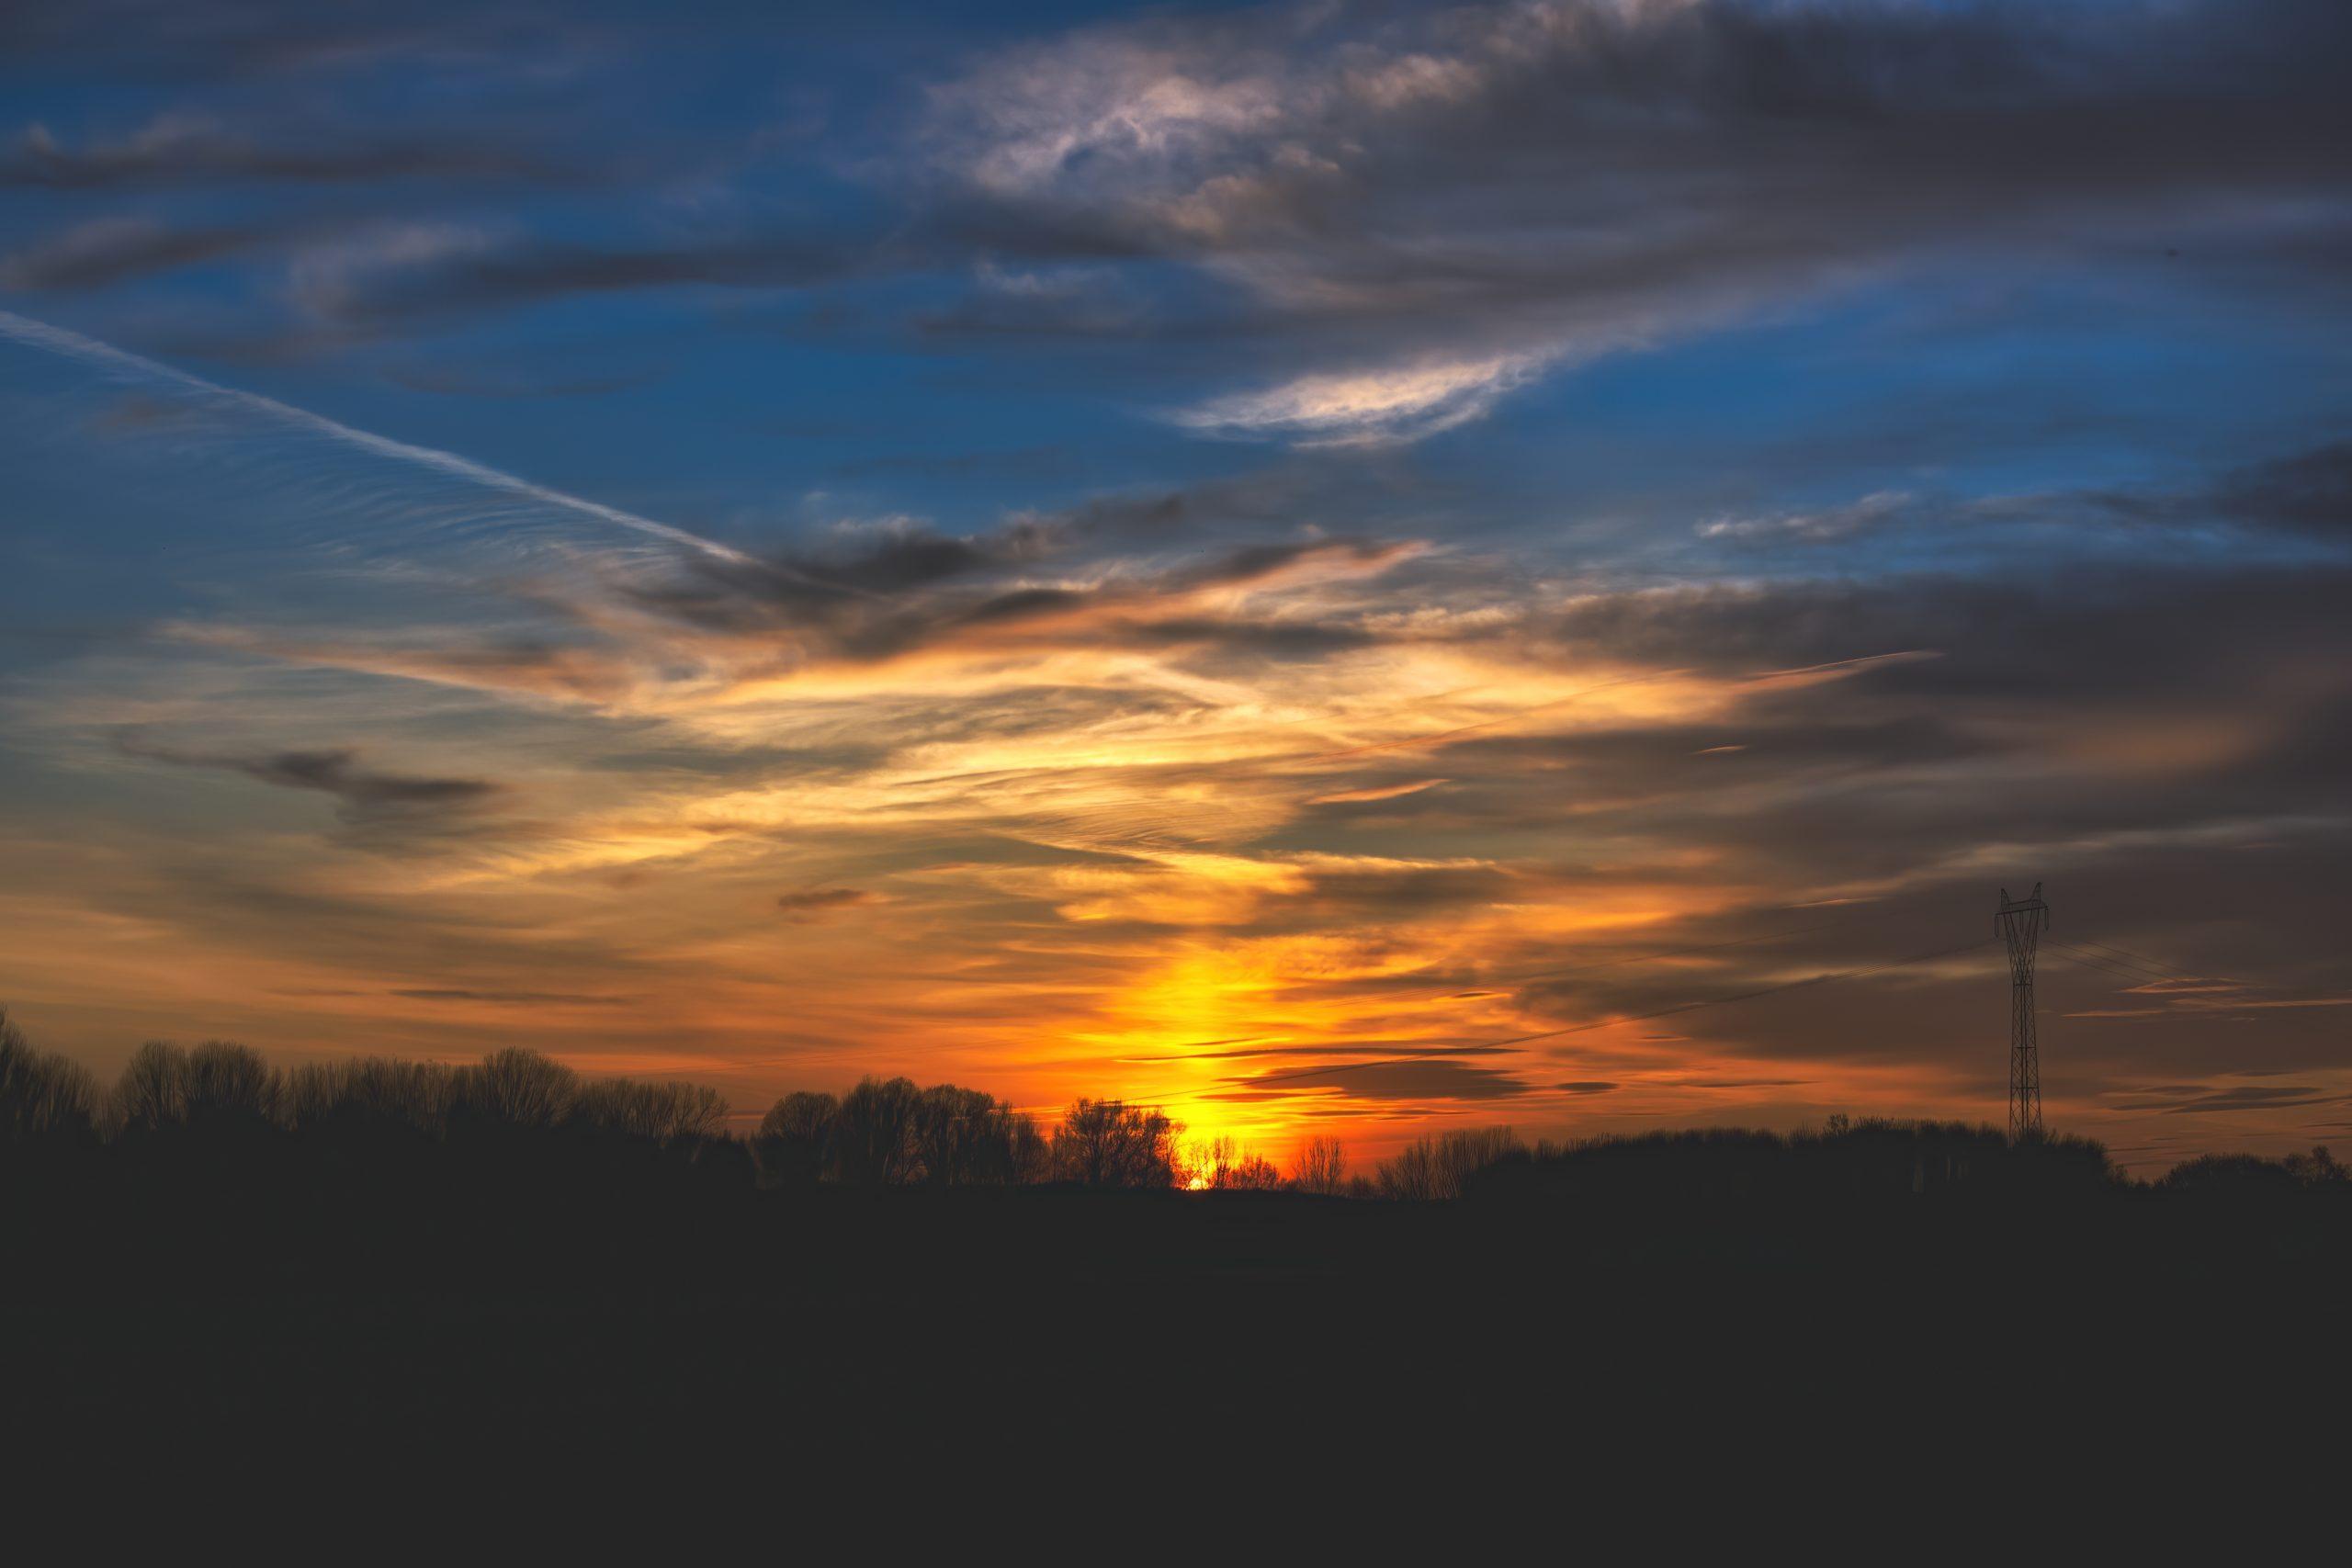 Sunset_2-denoise-denoise